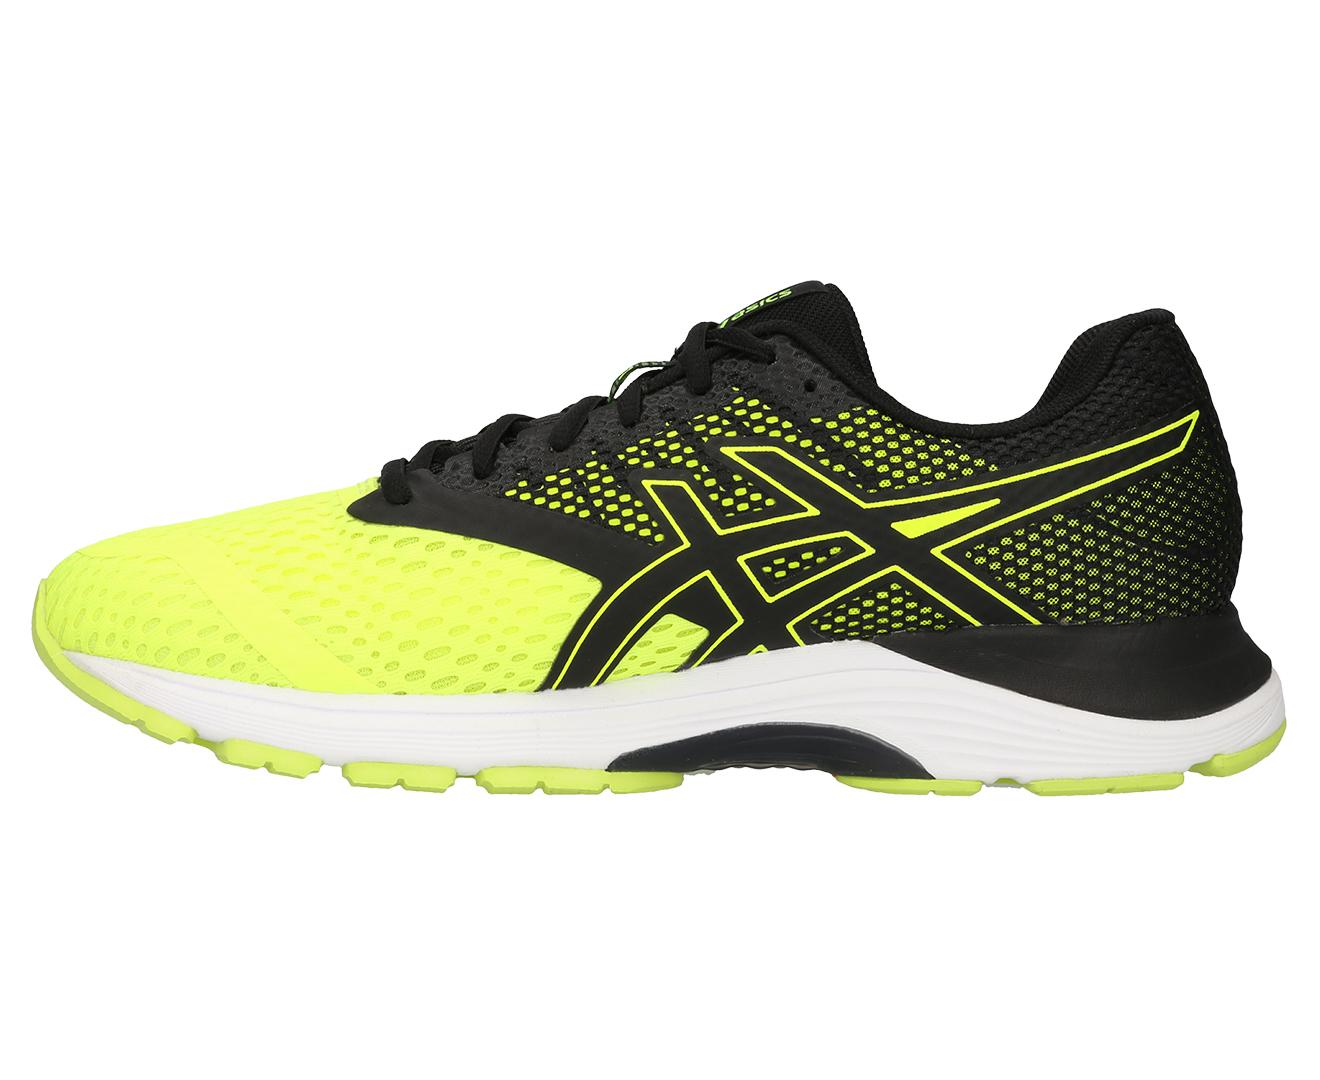 ASICS Men's Gel Pulse 10 Shoe Flash YellowBlack